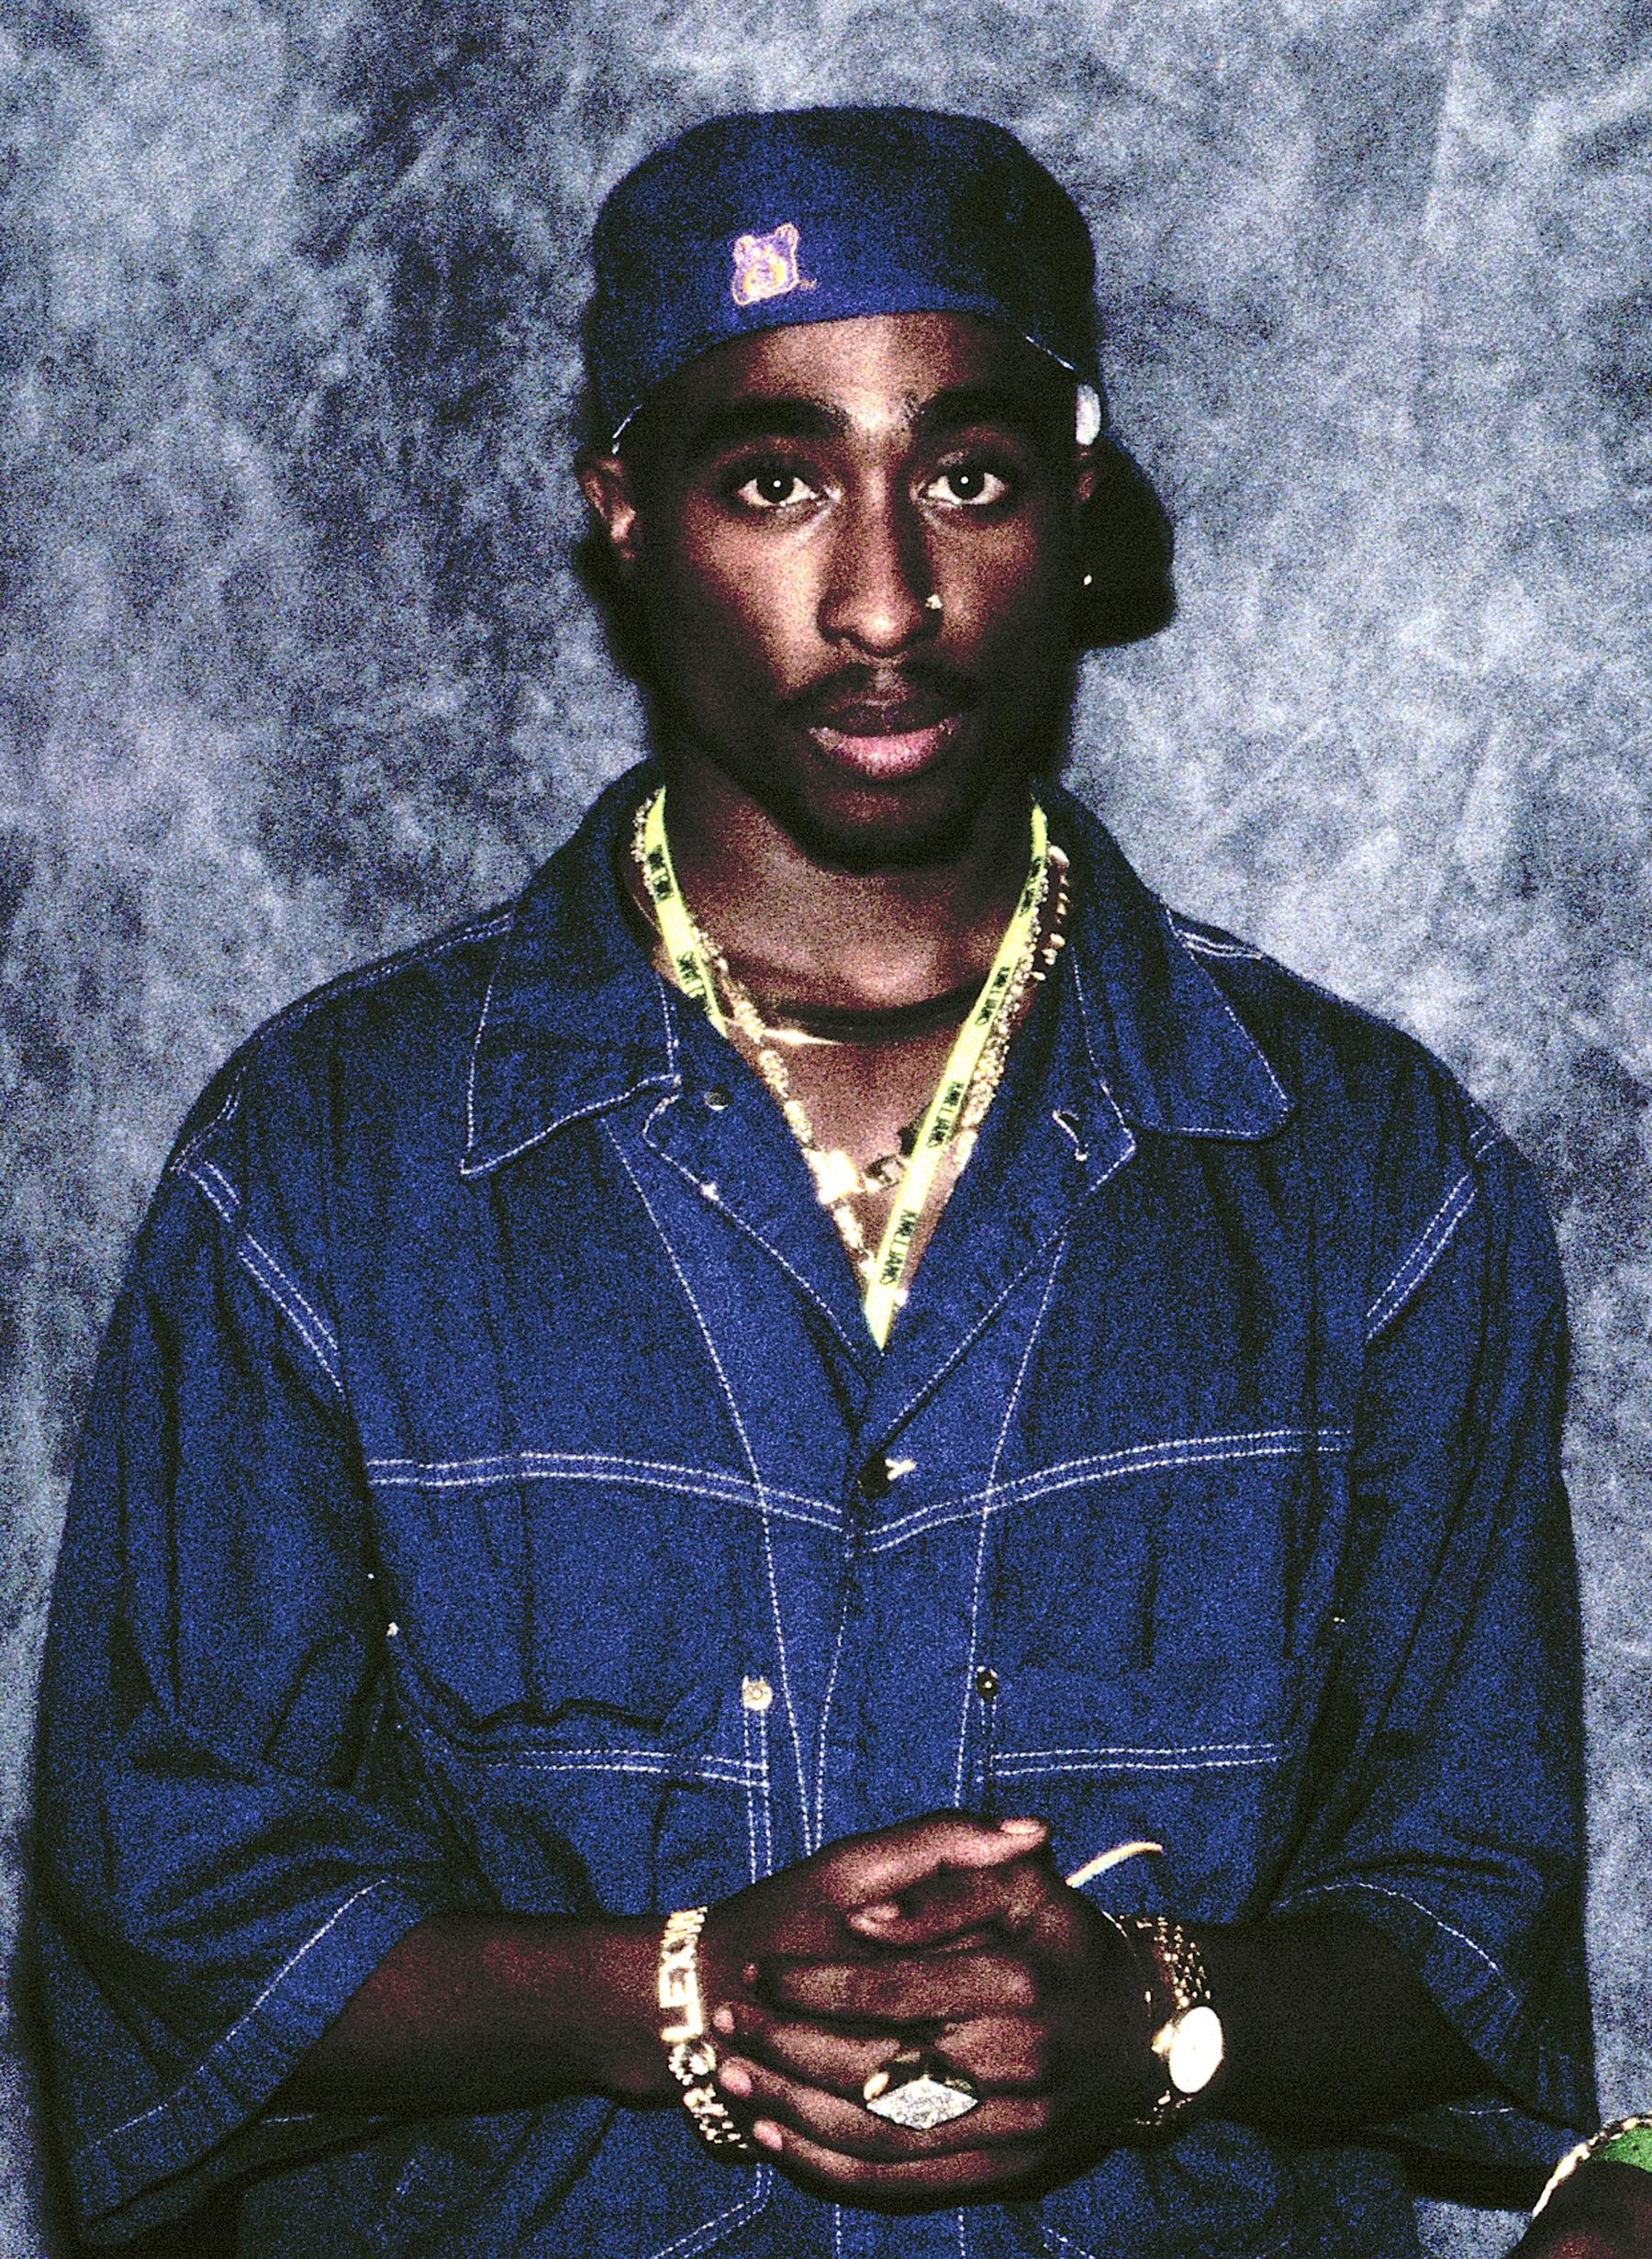 Read Tupac Shakur's Heartfelt Letter to Public Enemy's Chuck D